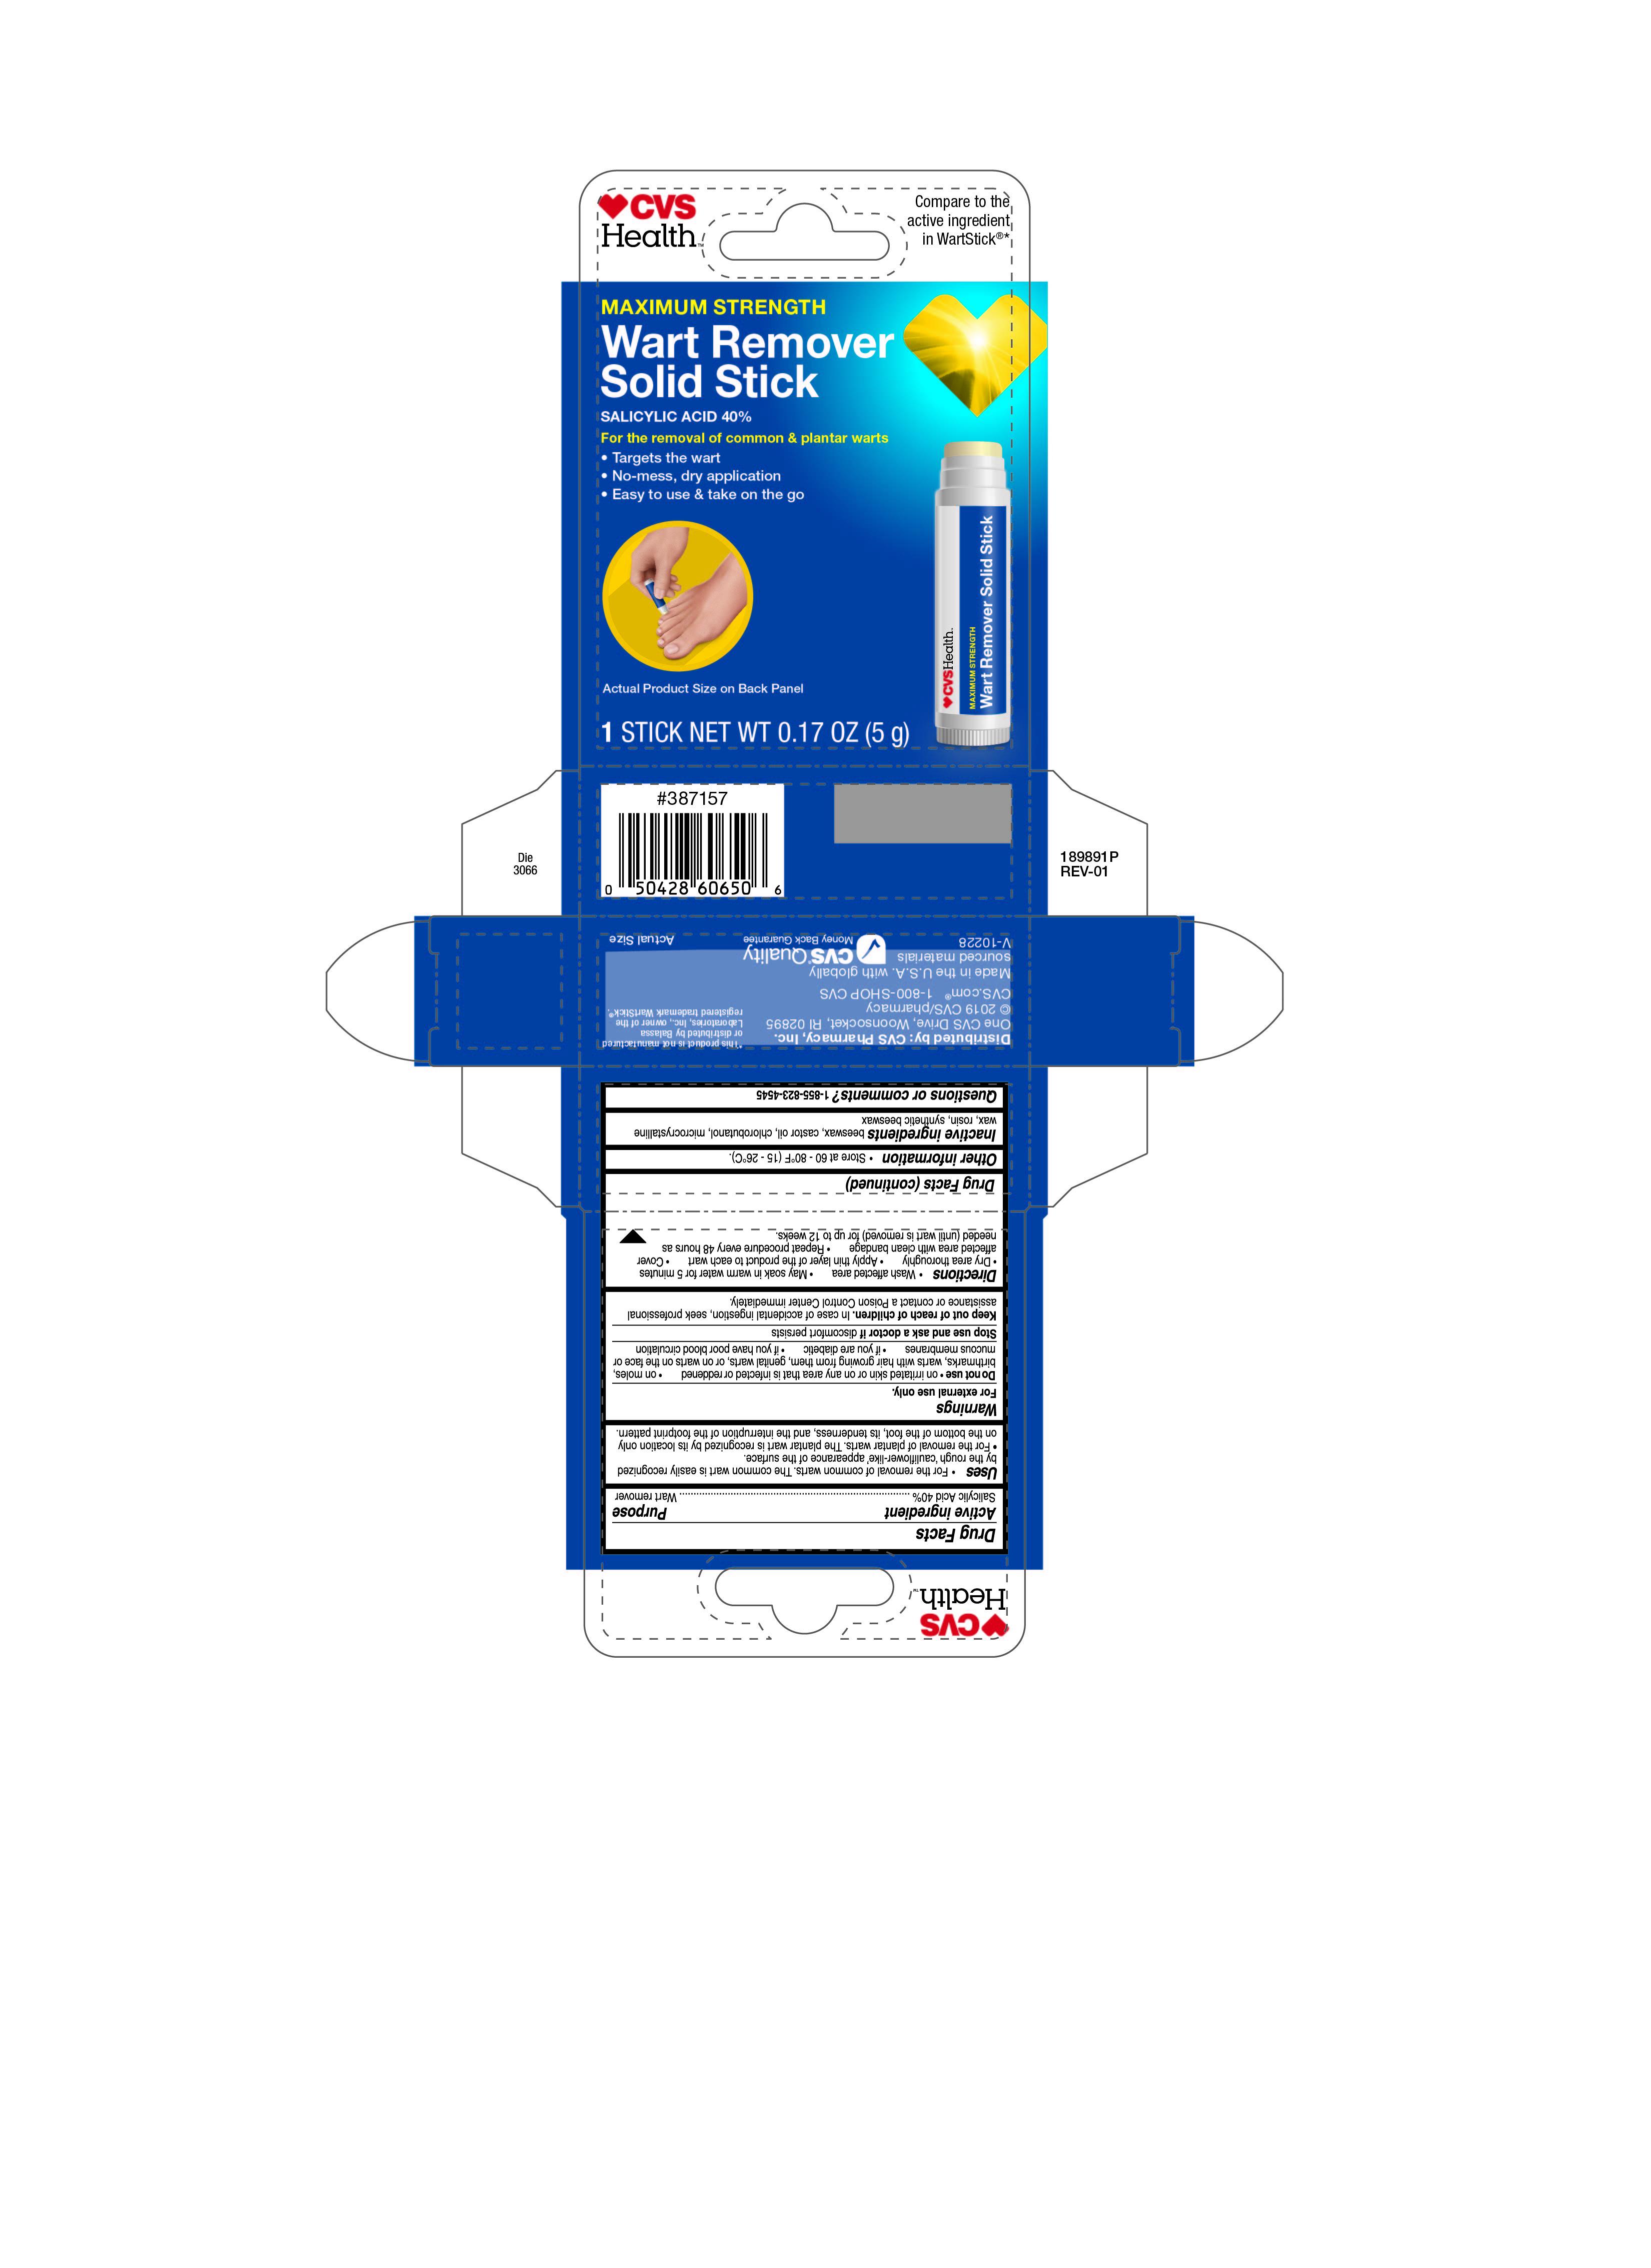 CVS Package Label